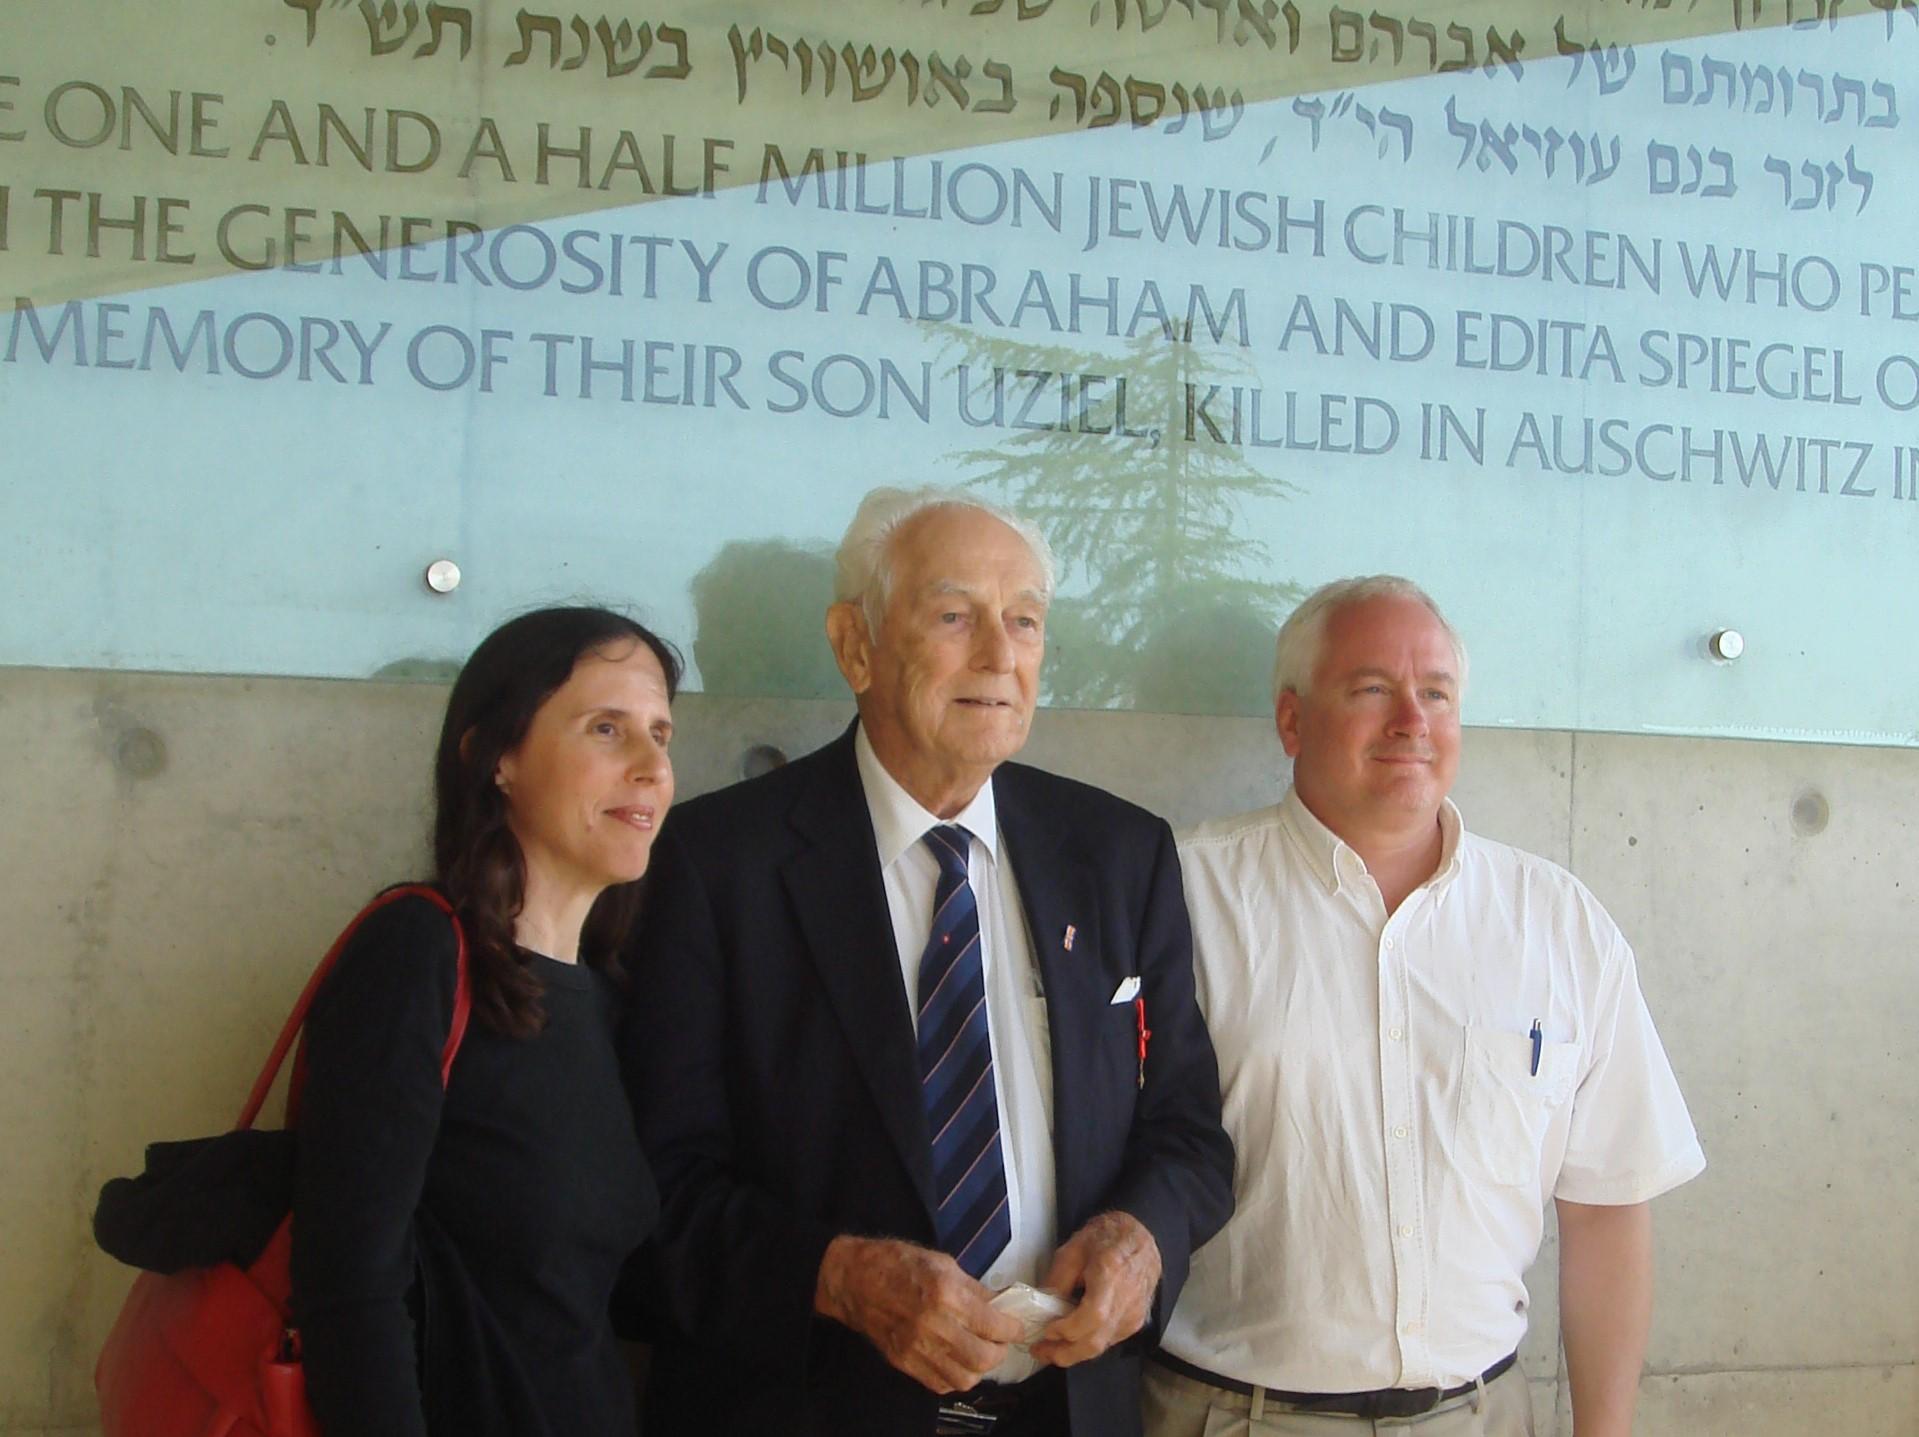 Varda Weisskopf, liberator Frank Towers, Matthew Rozell at Yad Vashem, May, 2011.